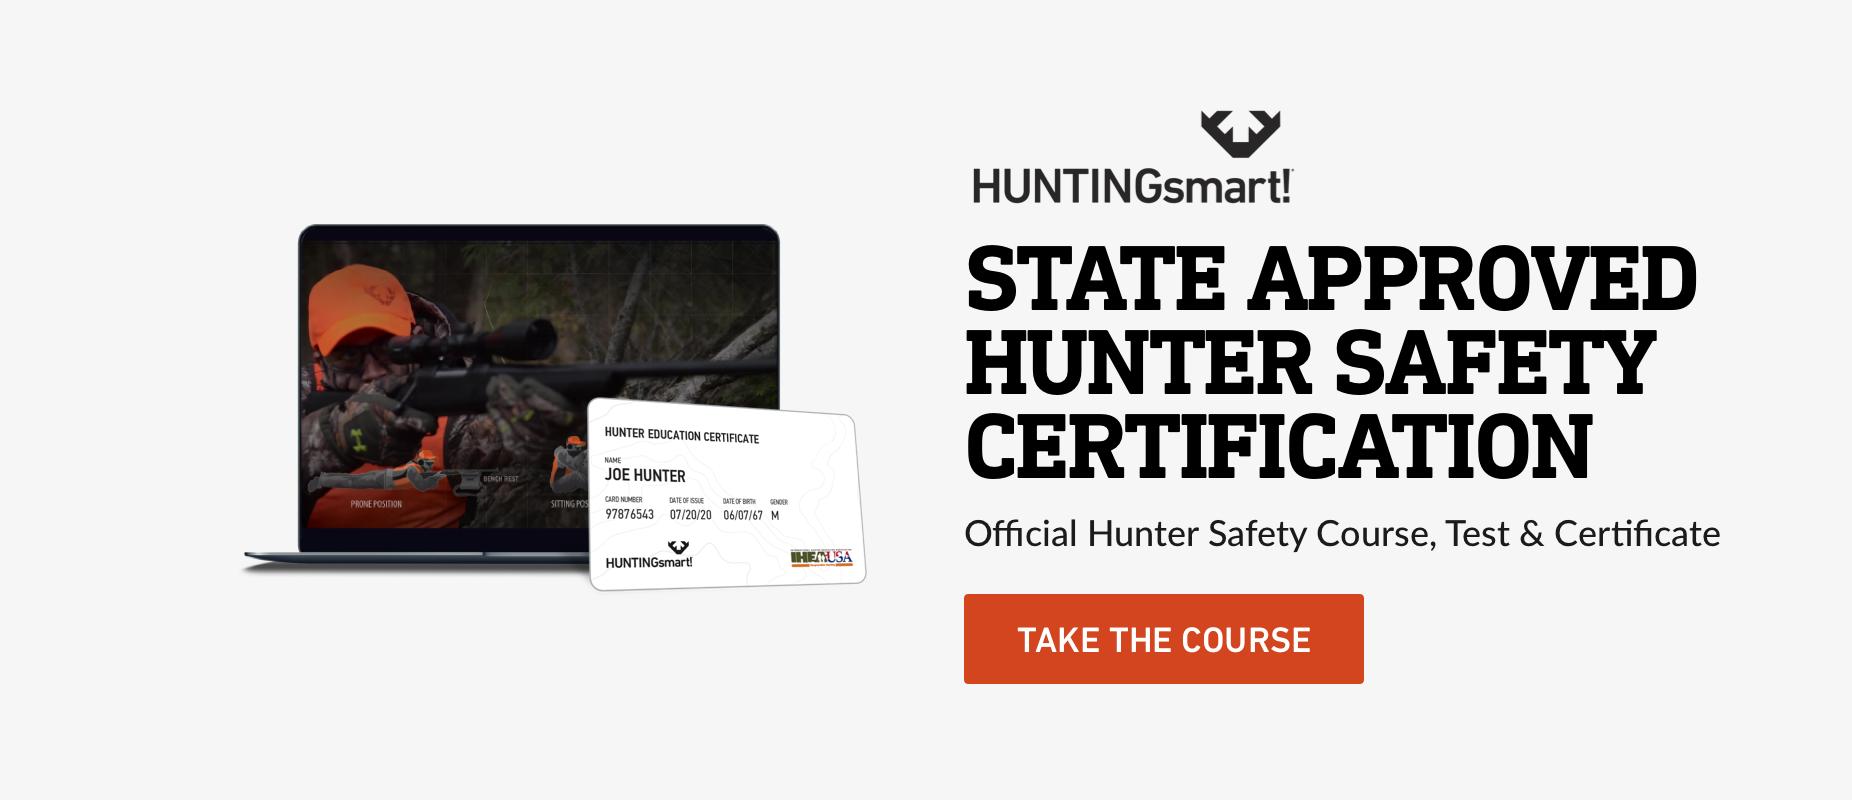 HUNTINGsmart!-Course